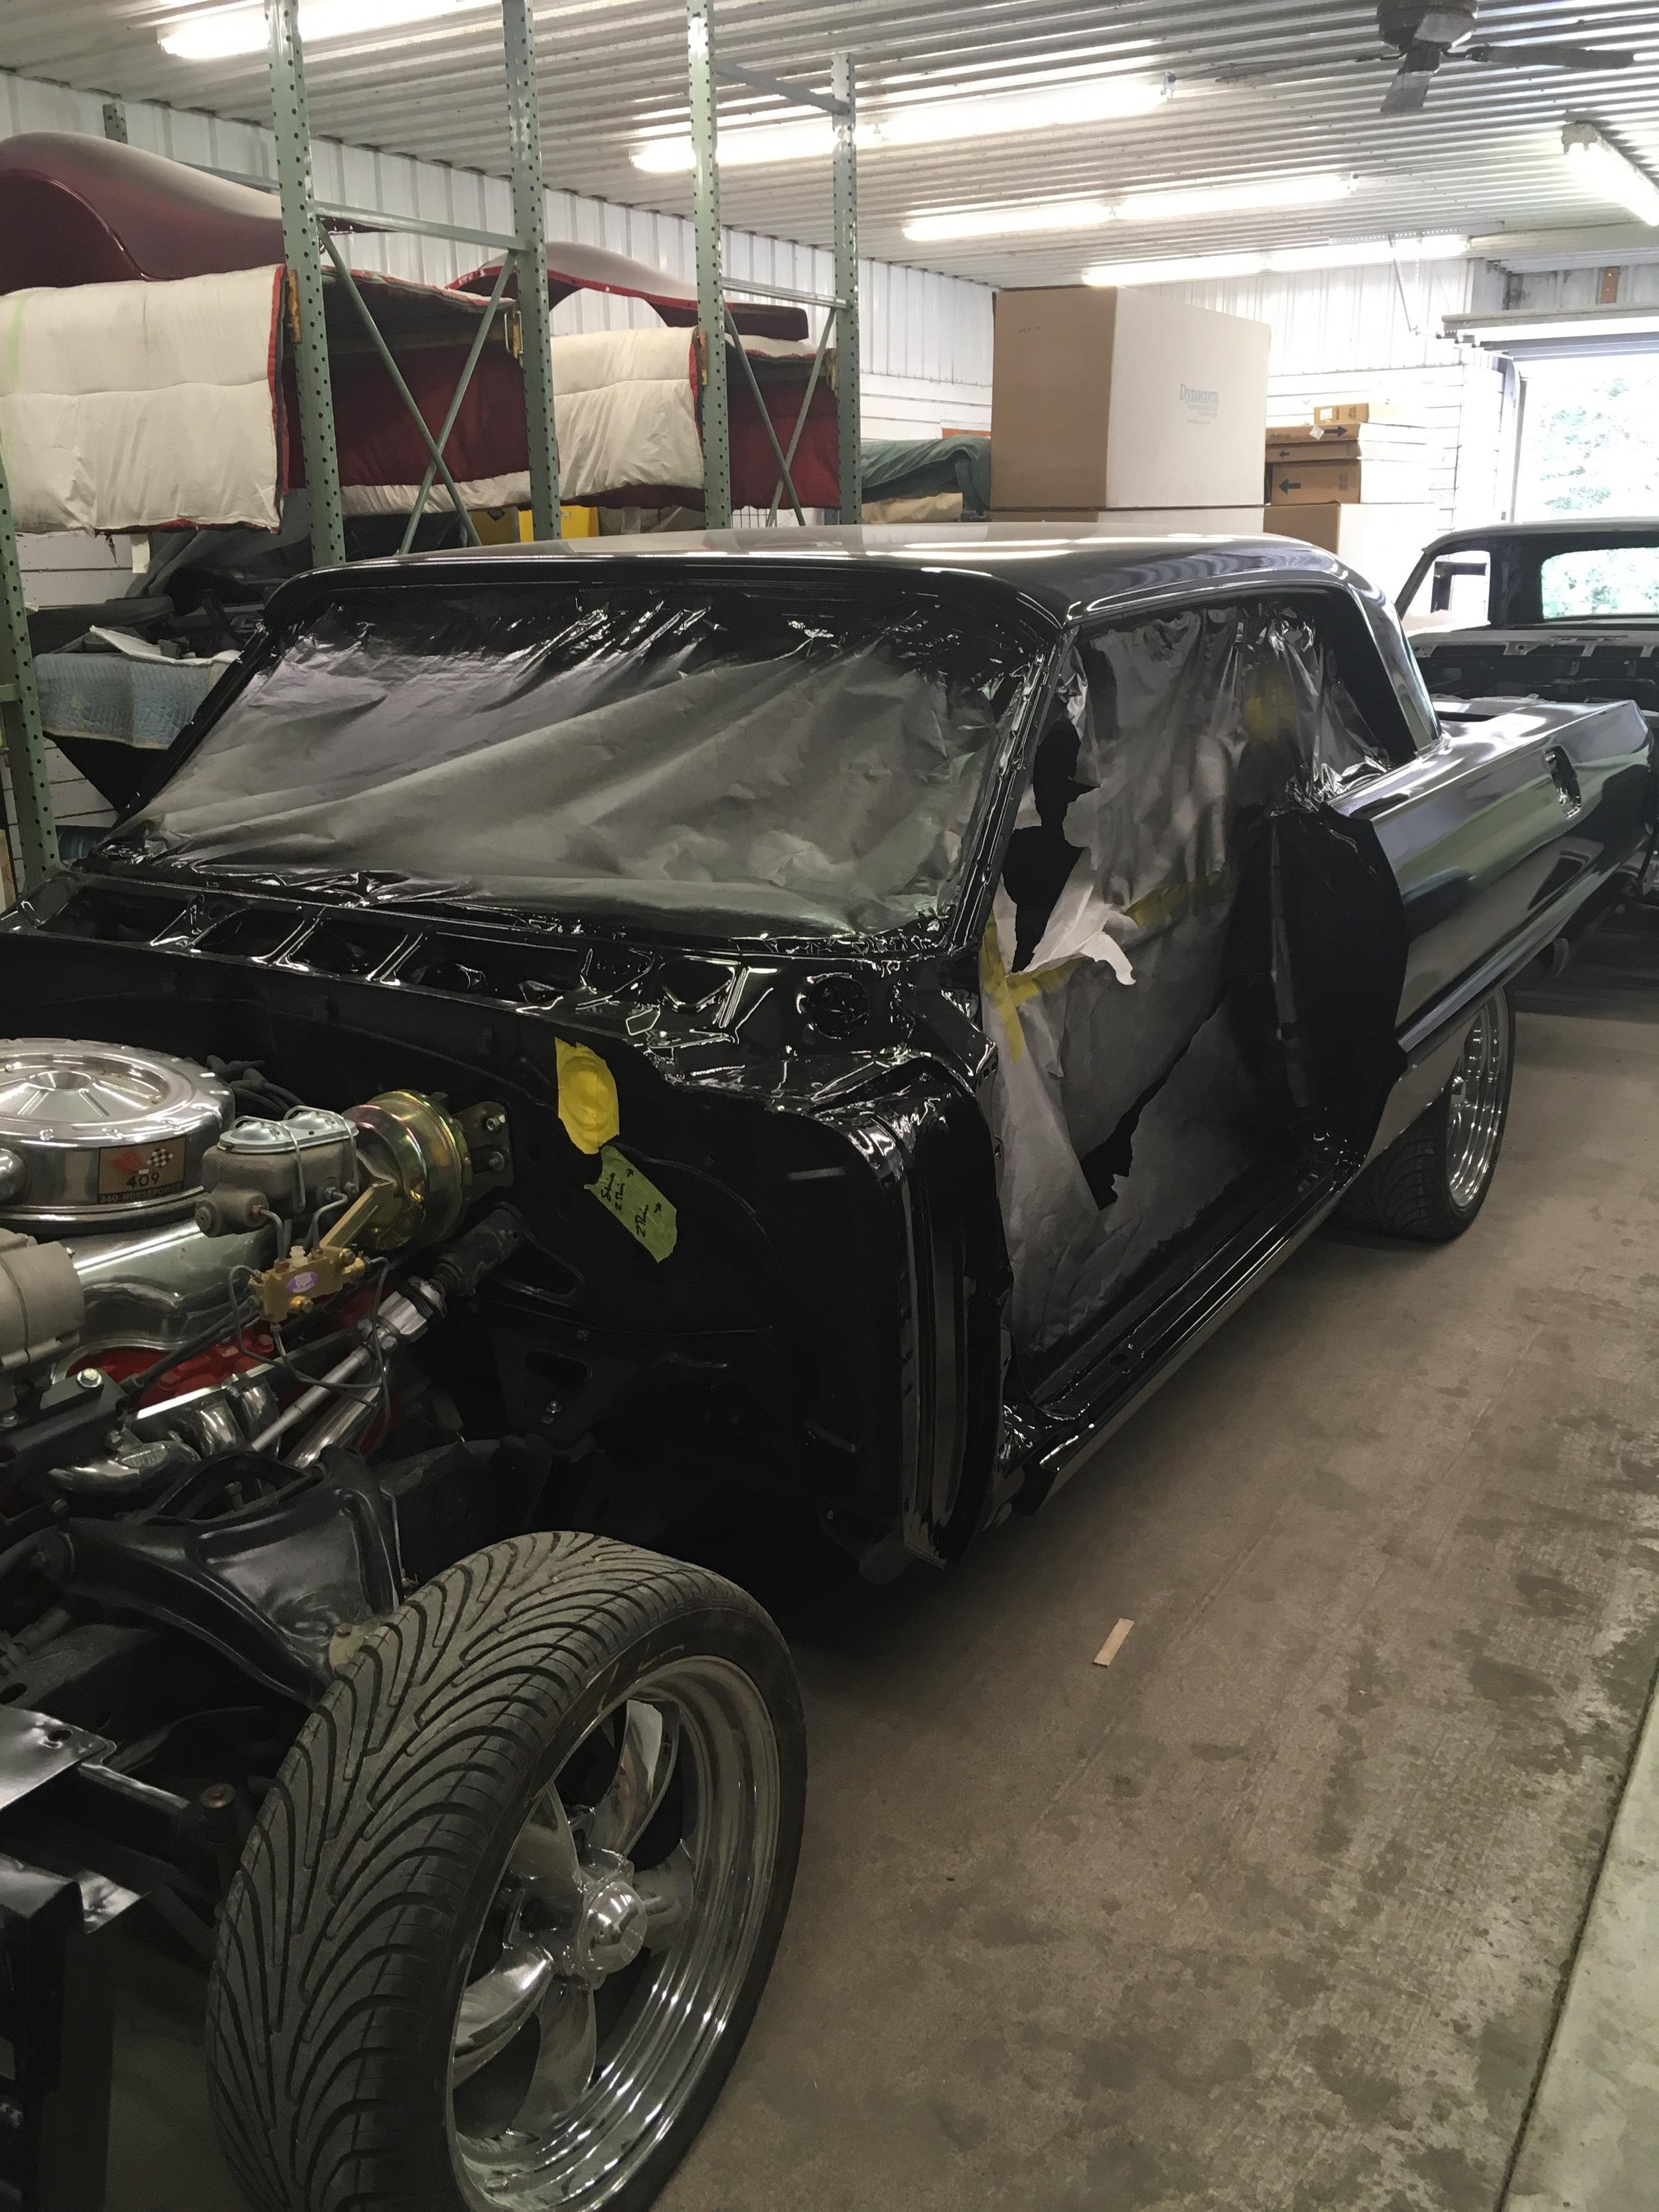 1964-Impala-SS-minneapolis-hot-rod-custom-built-restorations-3.jpg